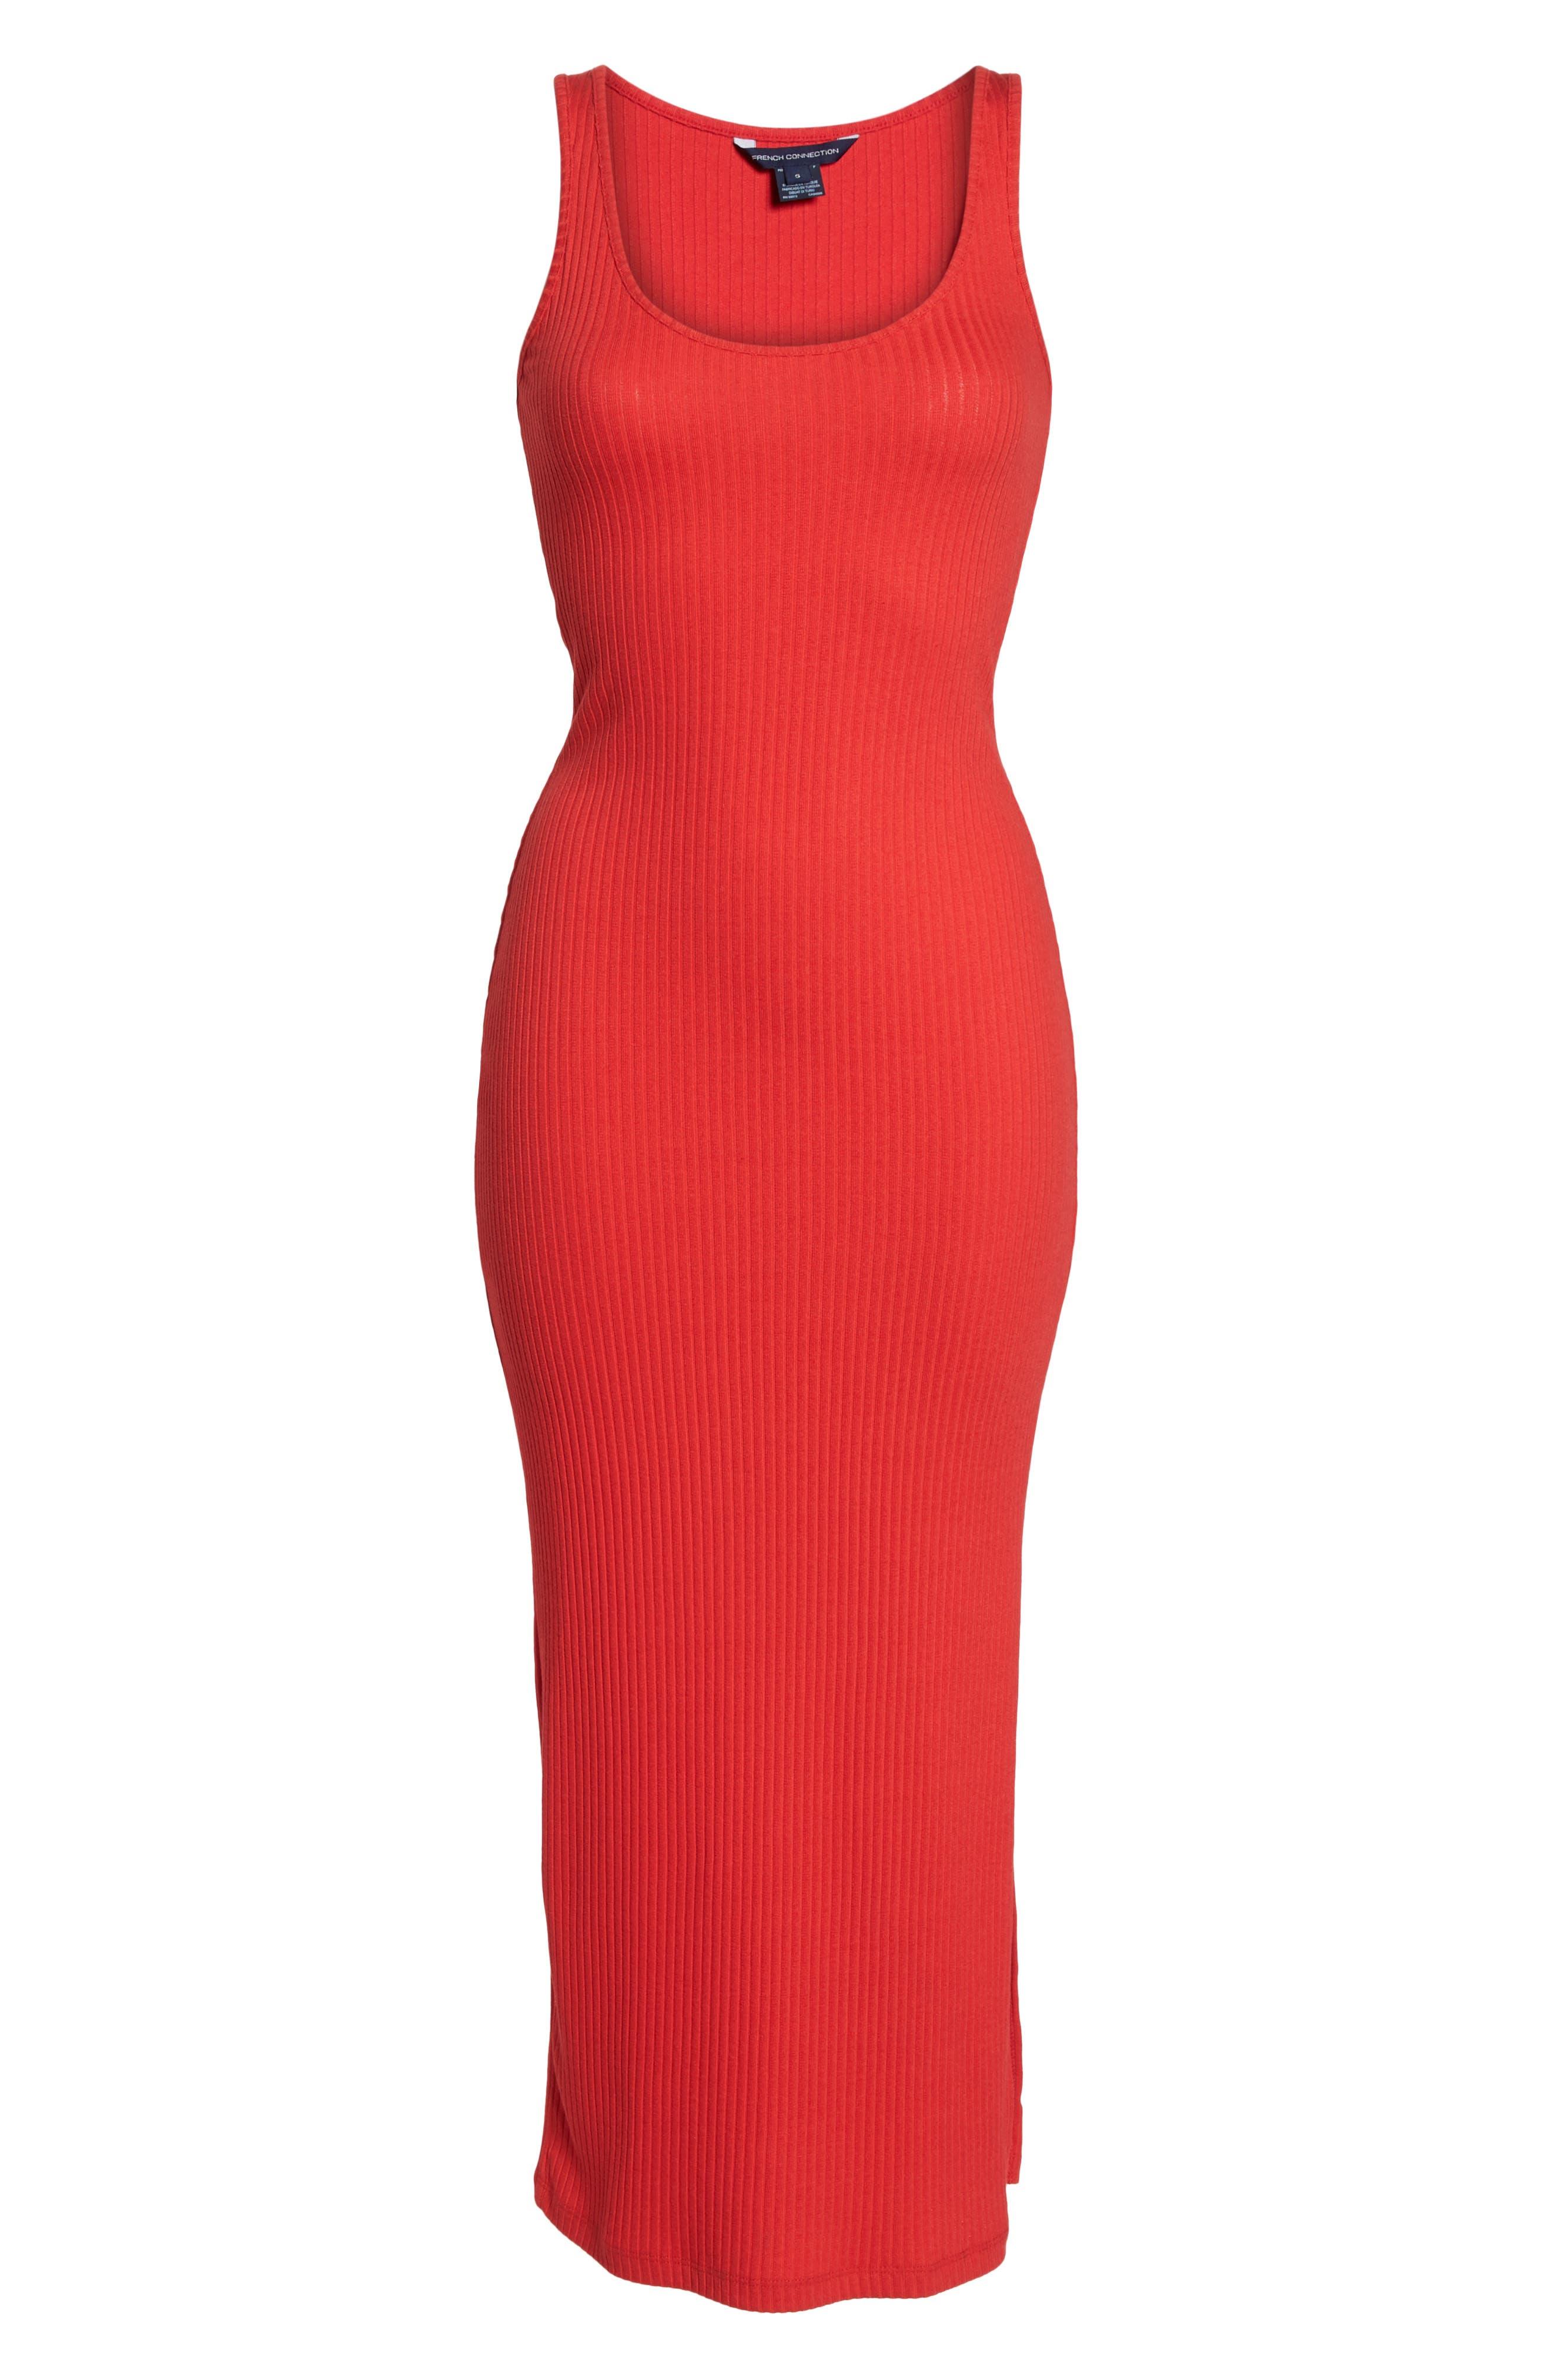 Tommy Rib Knit Tank Dress,                             Alternate thumbnail 7, color,                             SHANGHAI RED